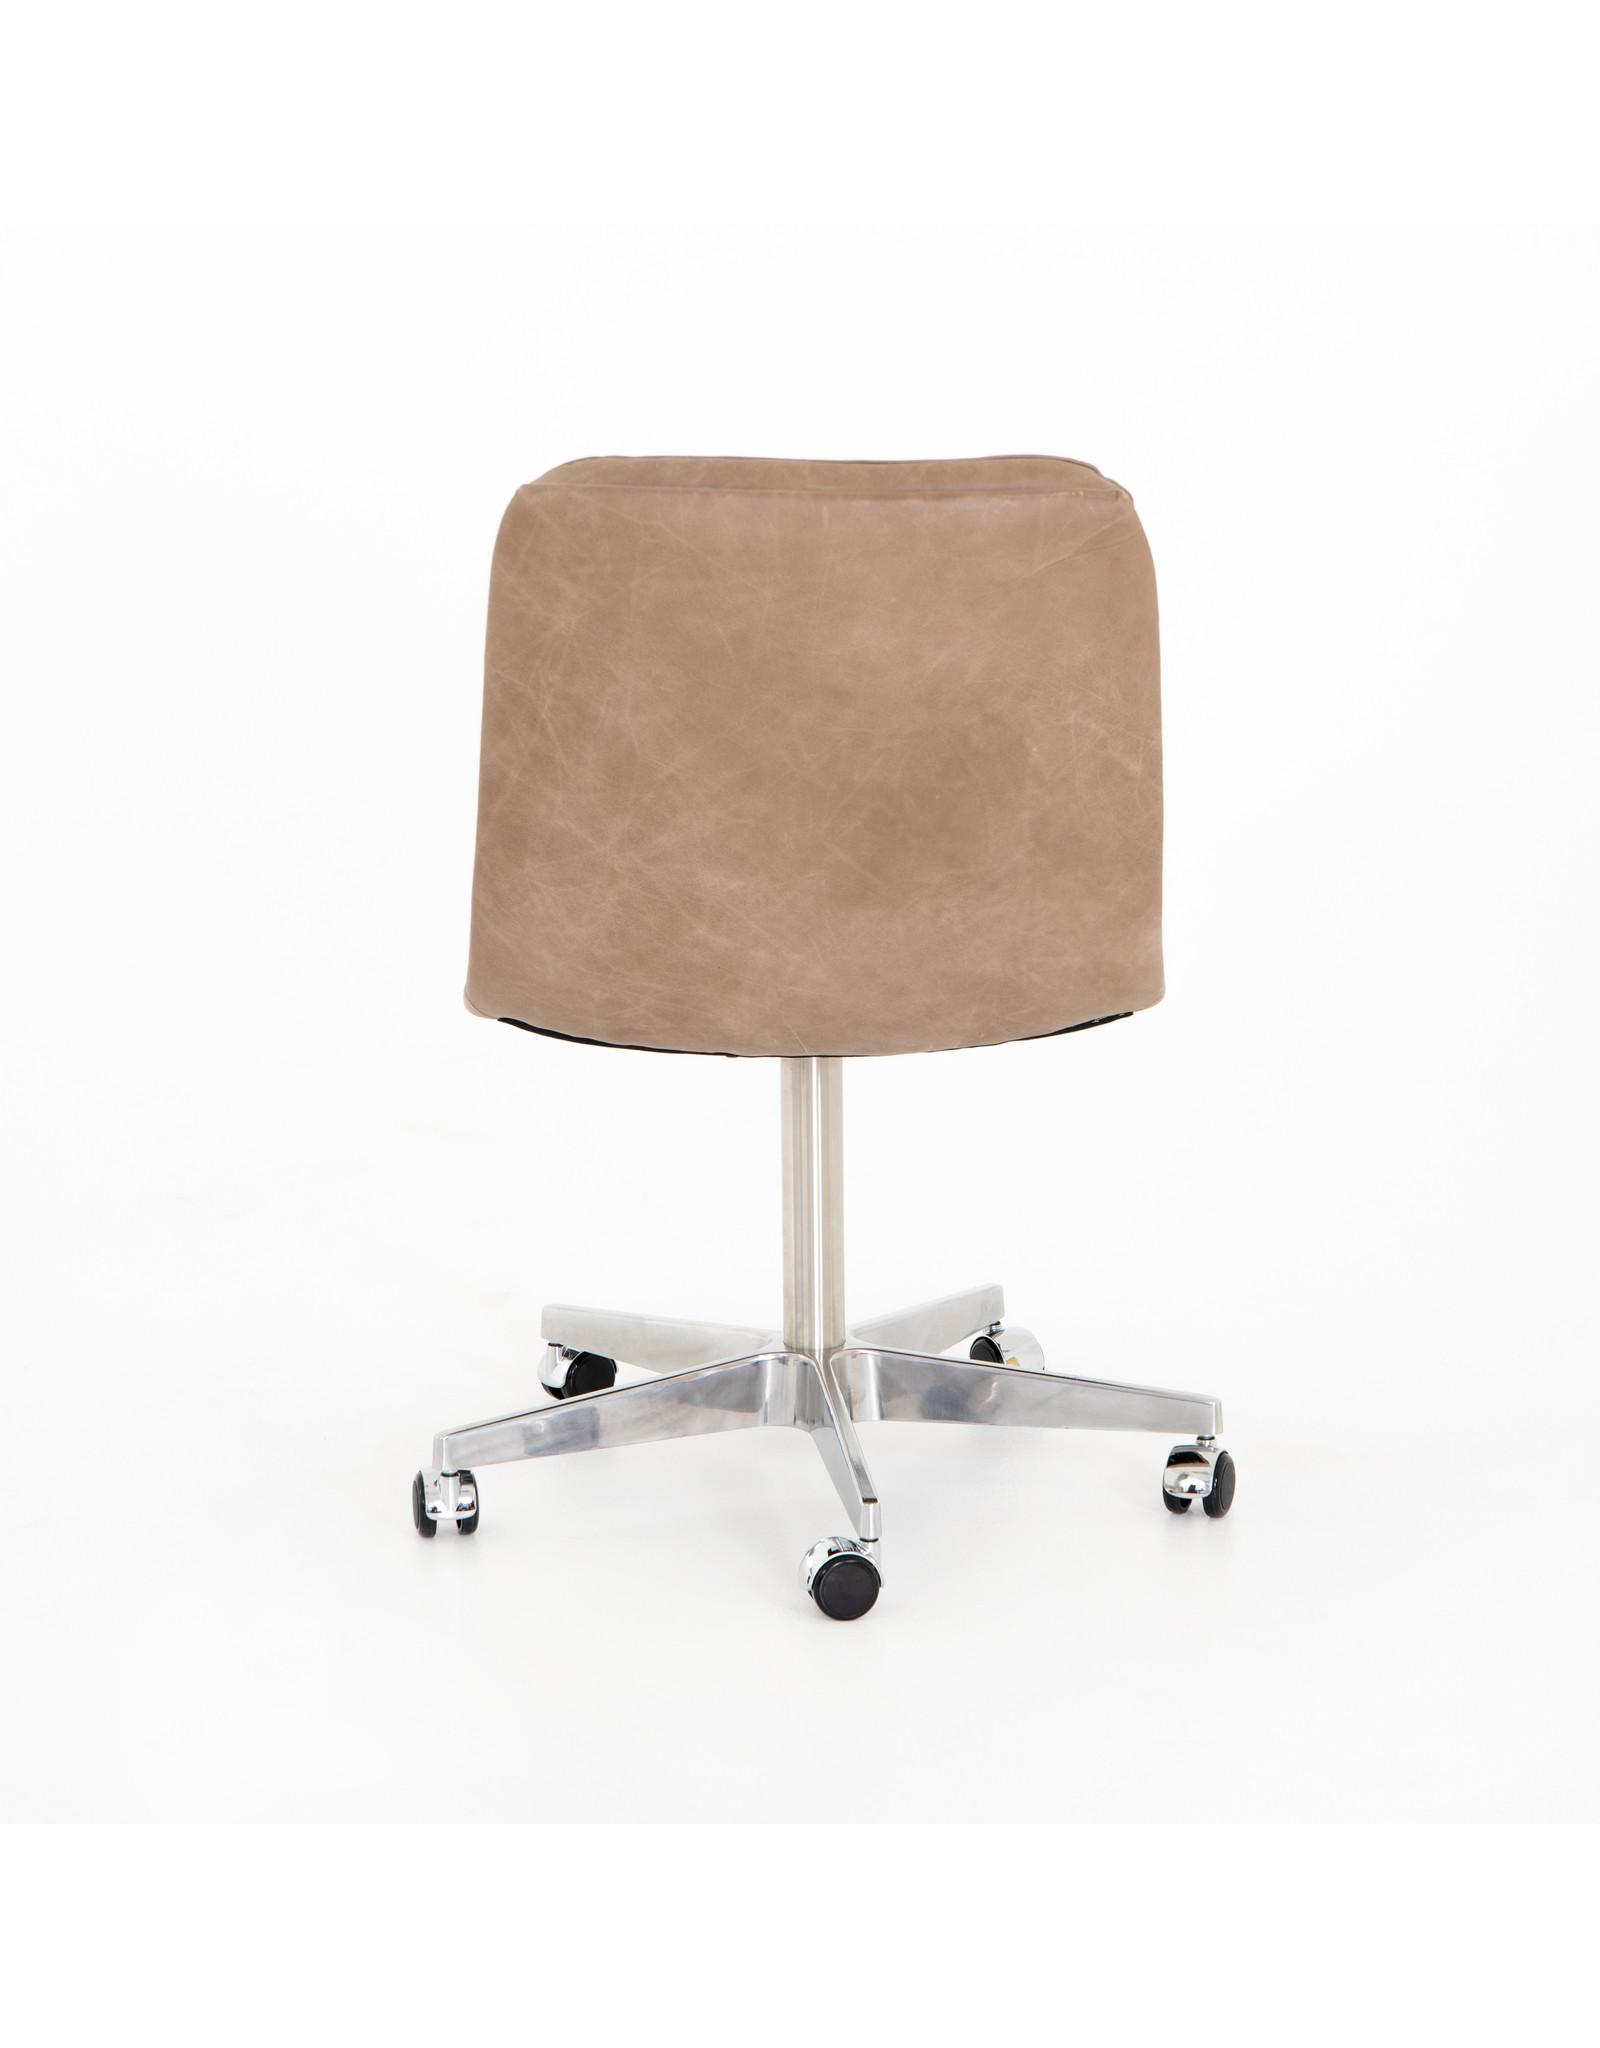 *Malibu Desk Chair - Natural Washed